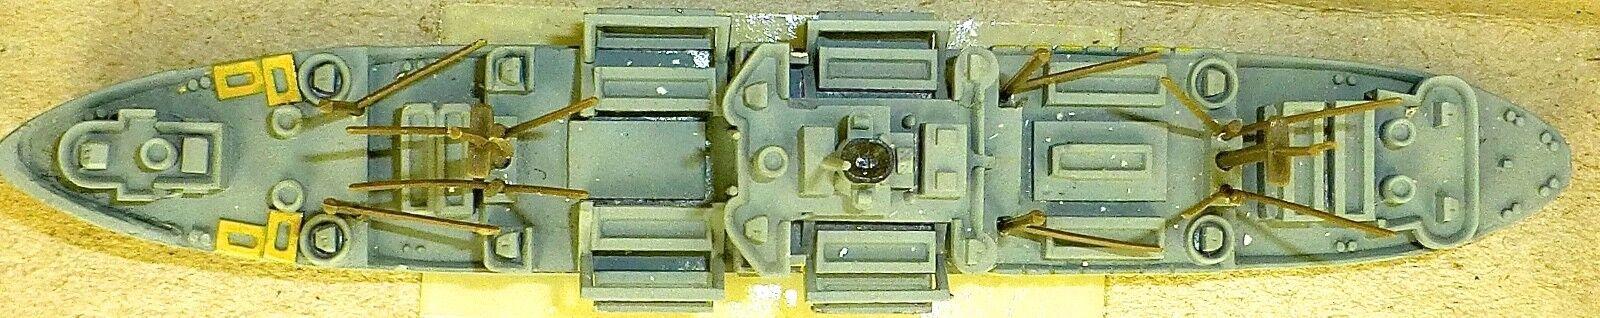 sizedega Etats-Unis Hansa 73 Modèle de Bateau Bateau Bateau 1 1250 Shpx07 Å 3d823b